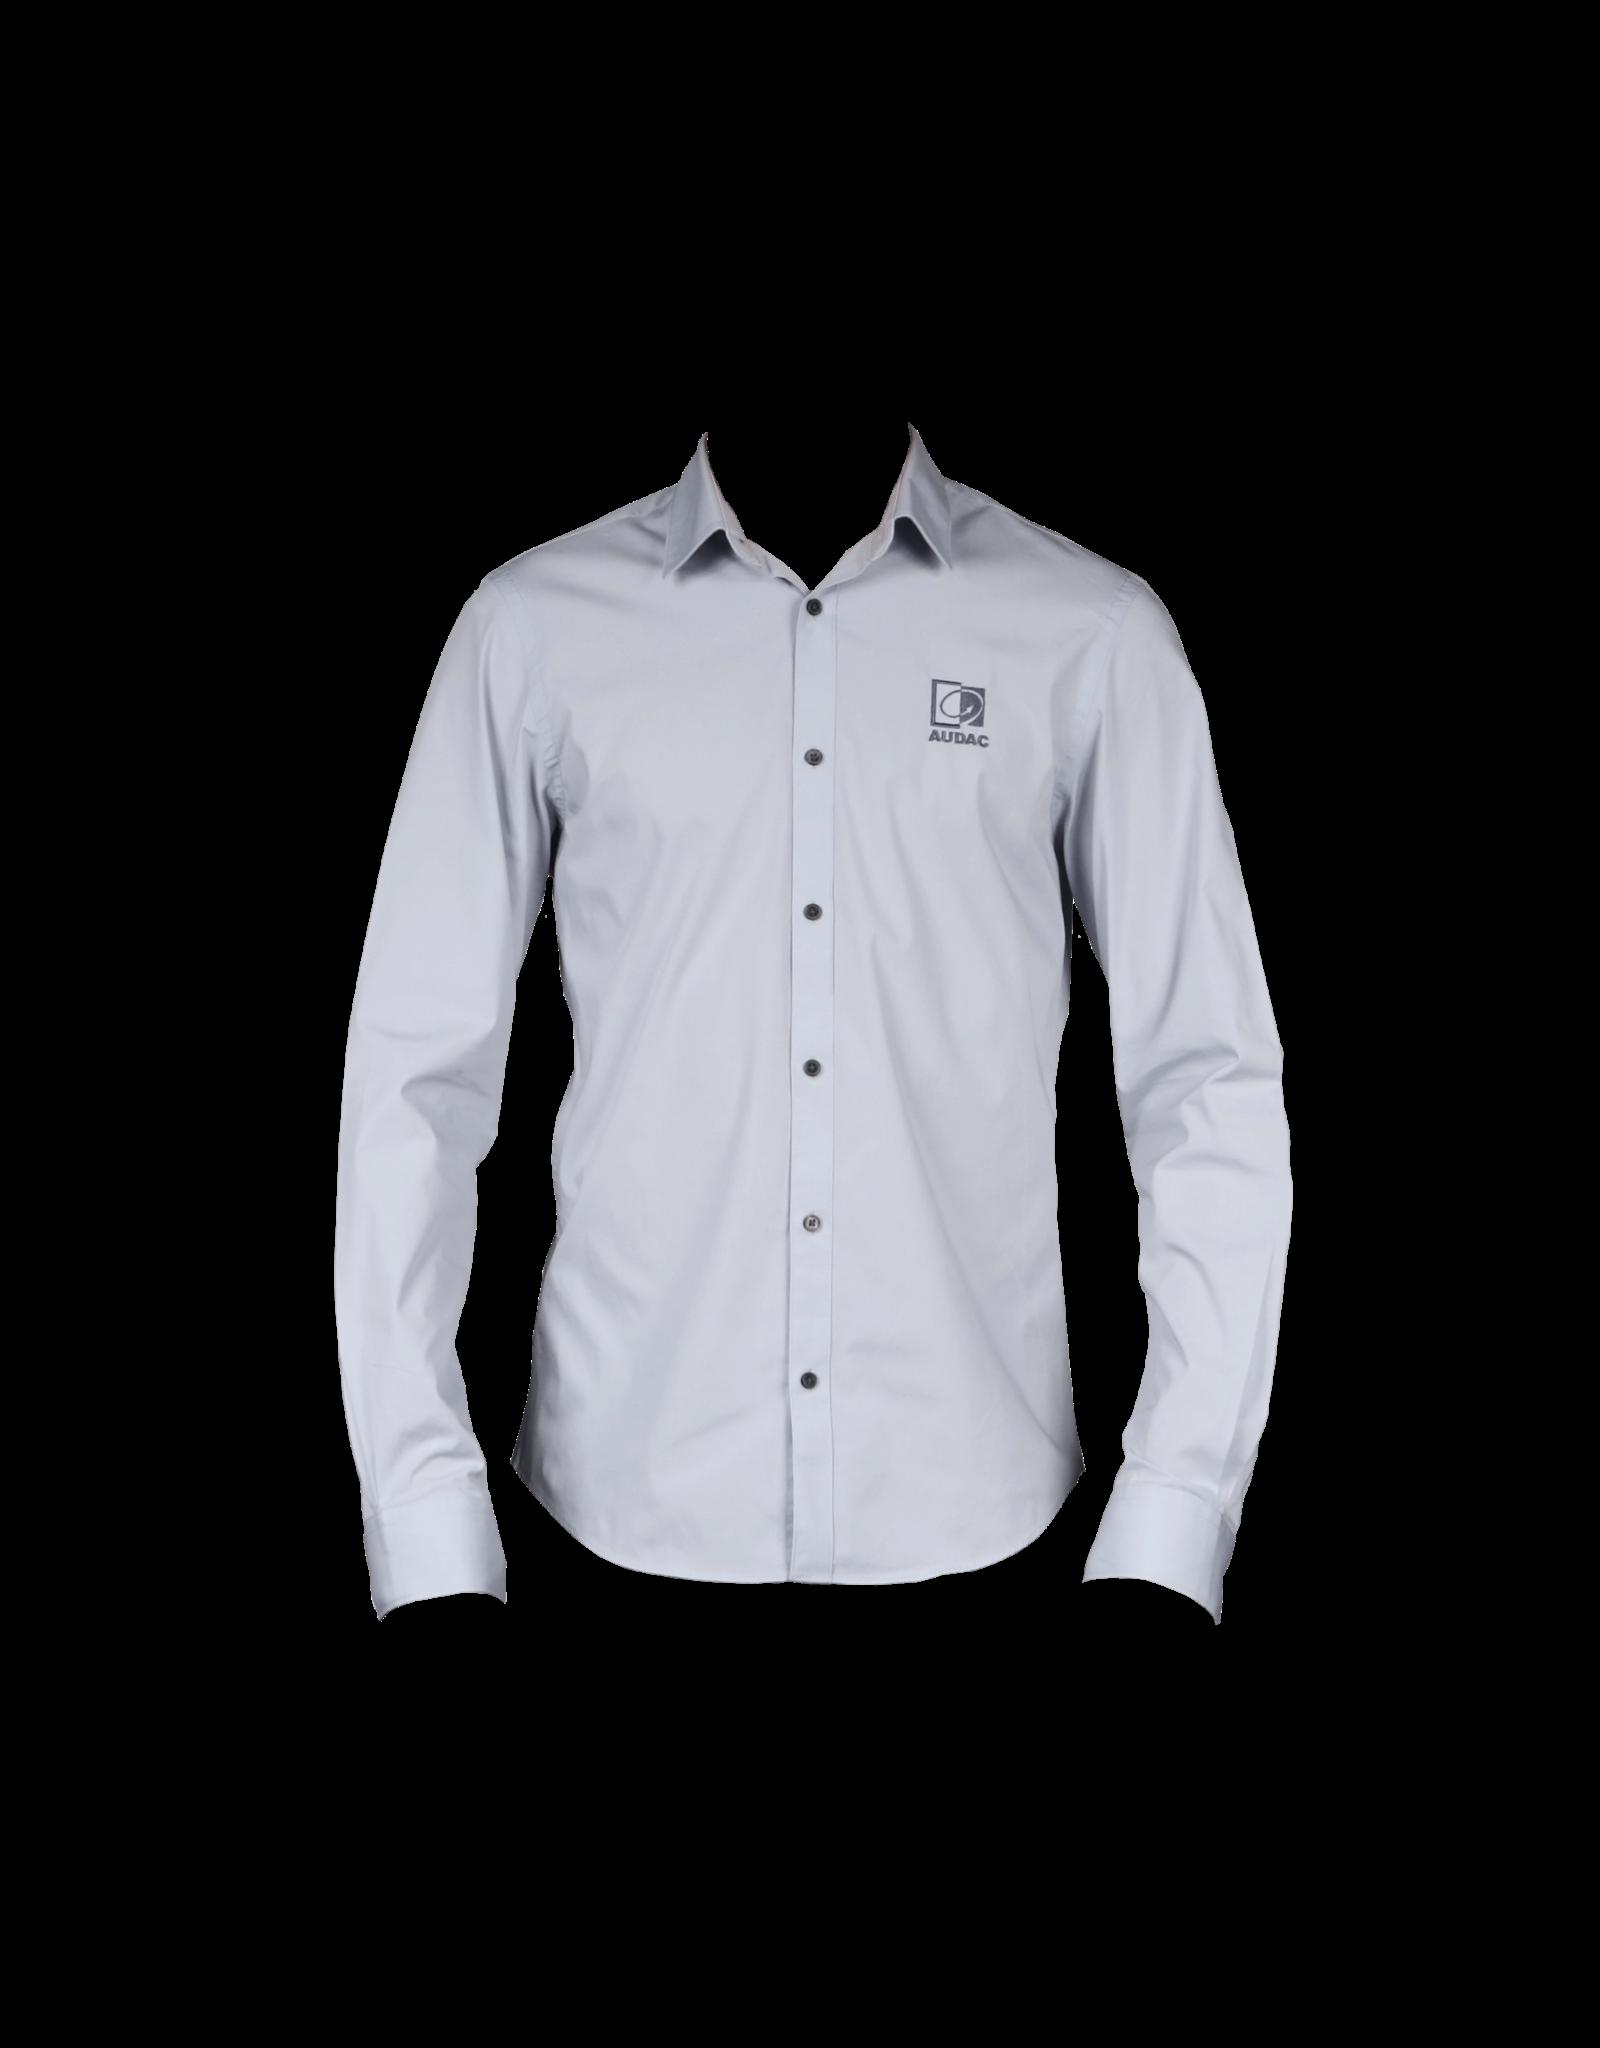 Audac Promotion shirt MEDIUM